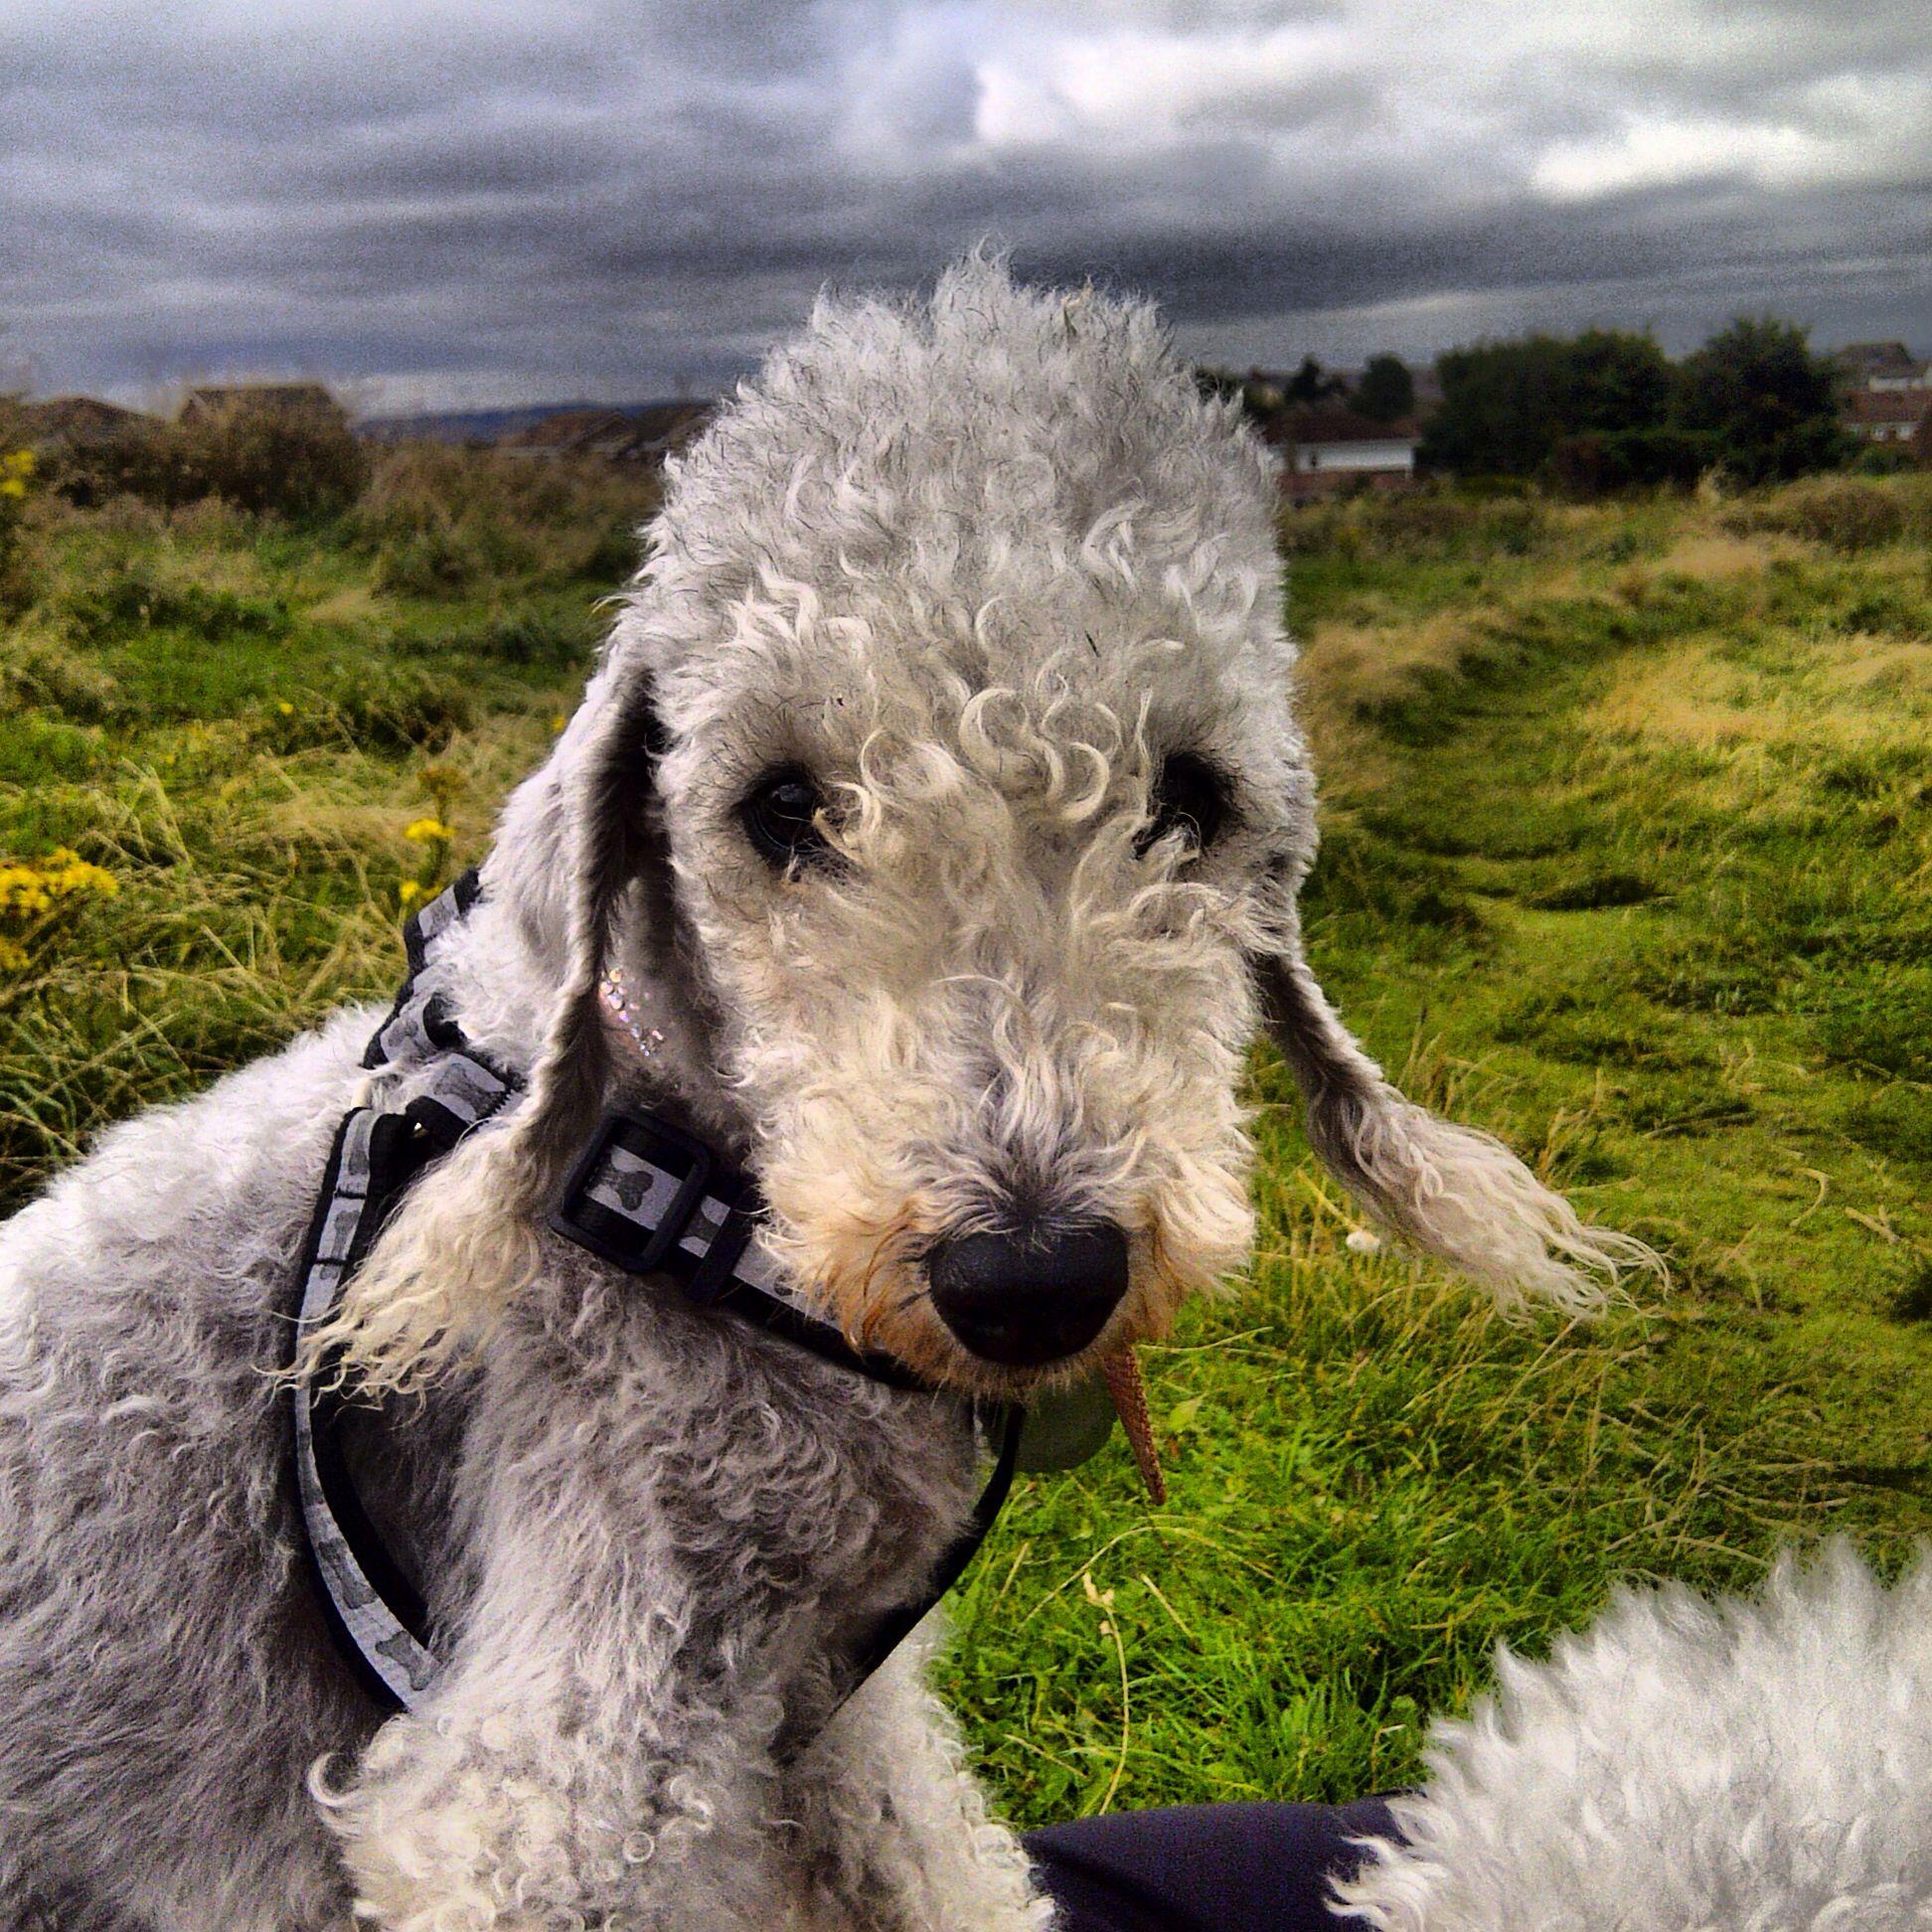 Bedlington Terrier Puppies Dogs Animal Puppy Dog